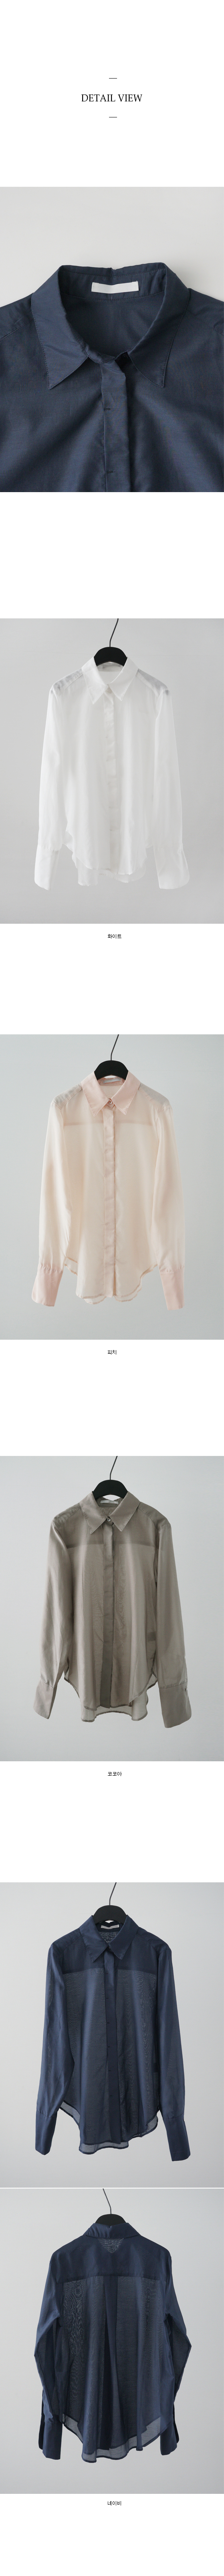 sensual mood silk shirt